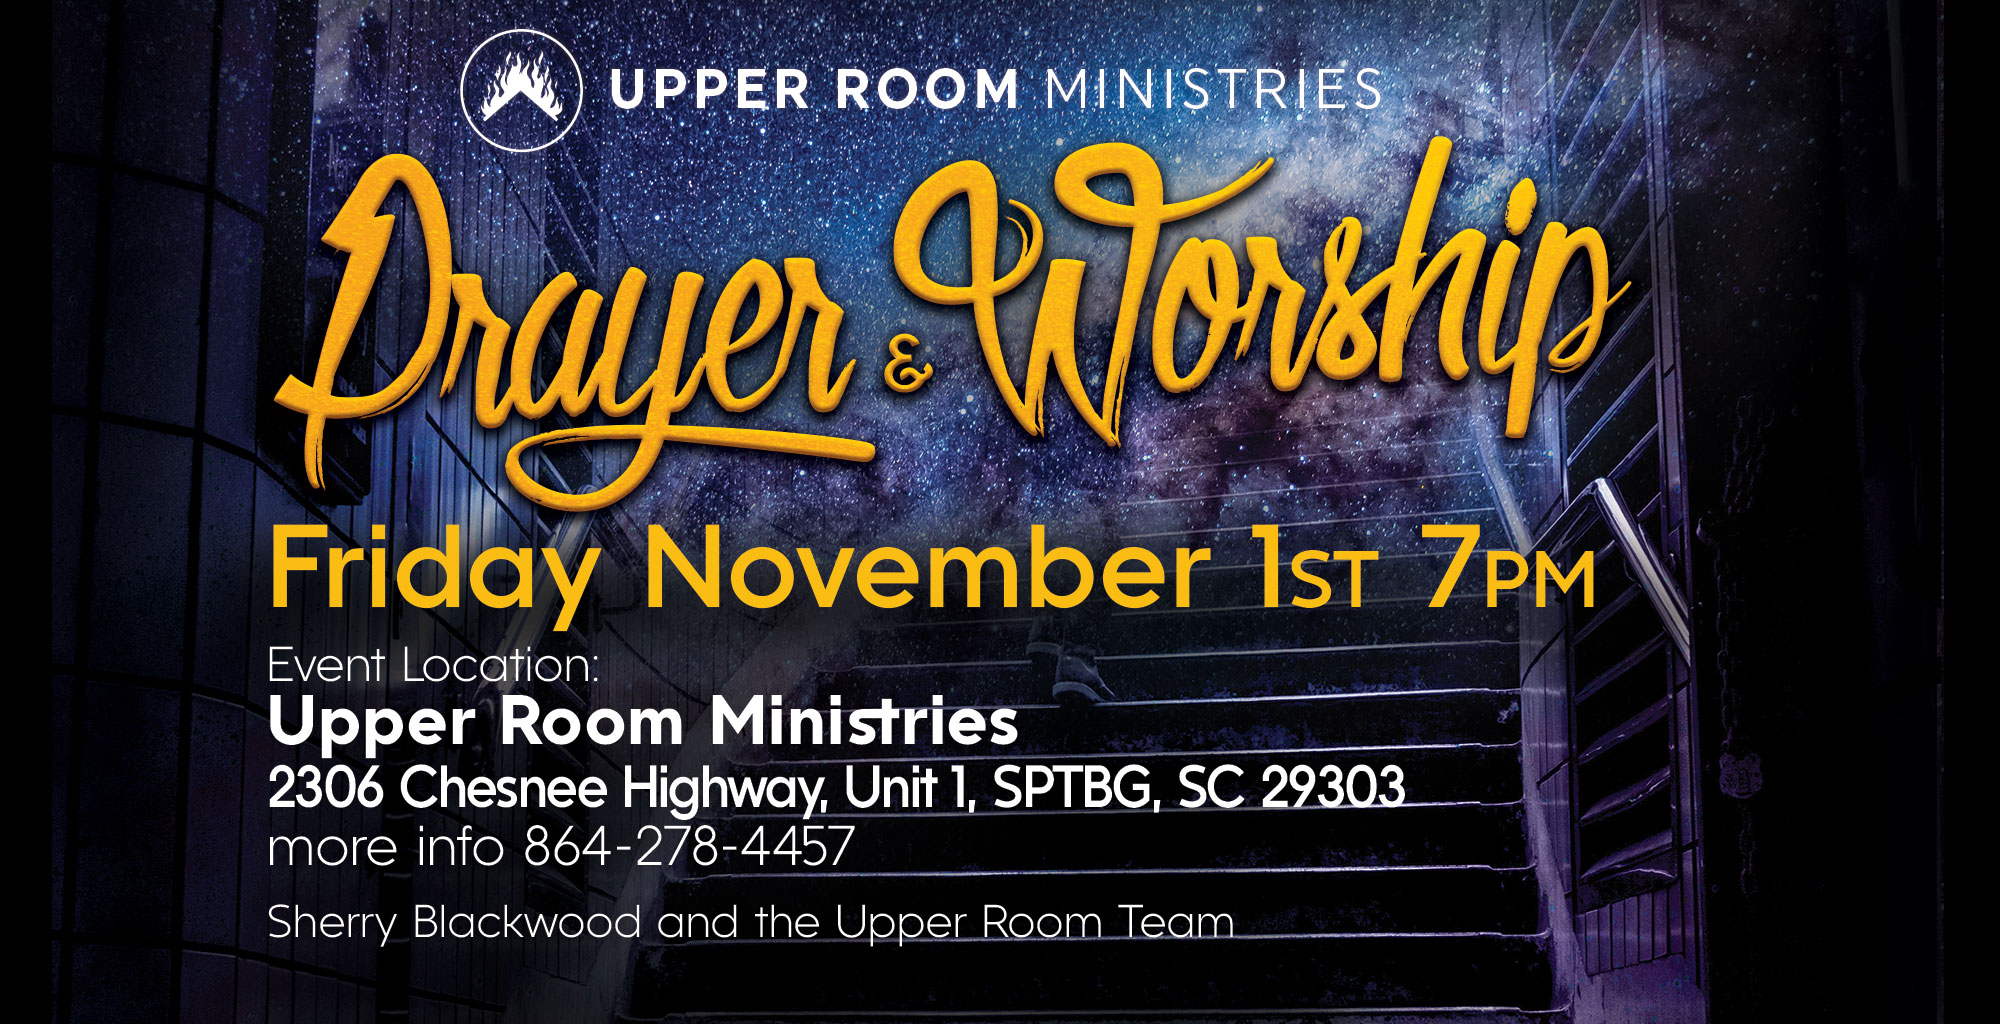 NewUpperRoom-Worship-Night-Nov1st-Slide